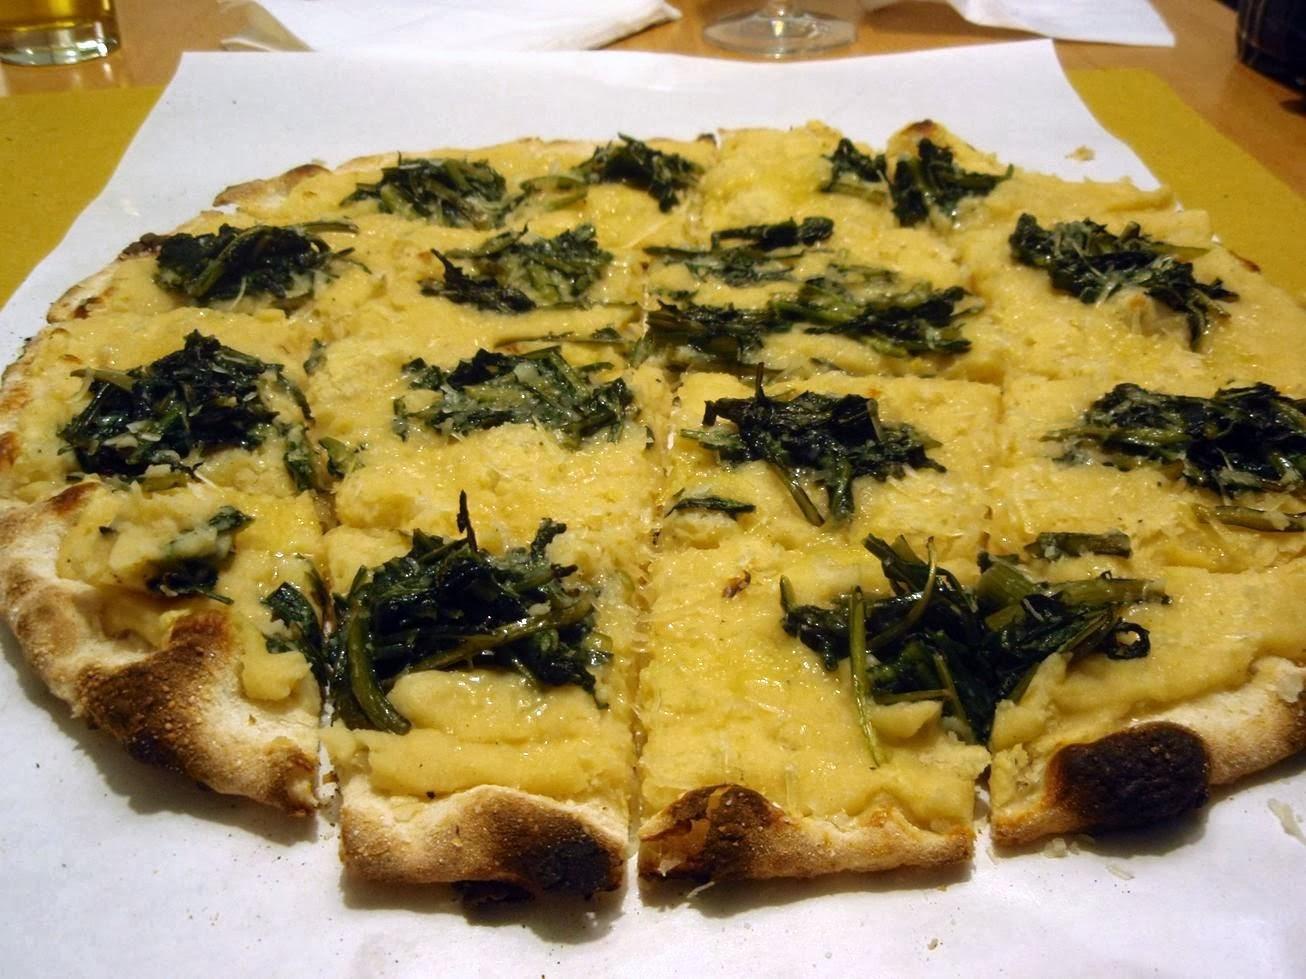 Crédito Foto: http://miblogderoma.blogspot.com.br/2014/04/pizzeria-farine-te-chuparas-los-dedos.html